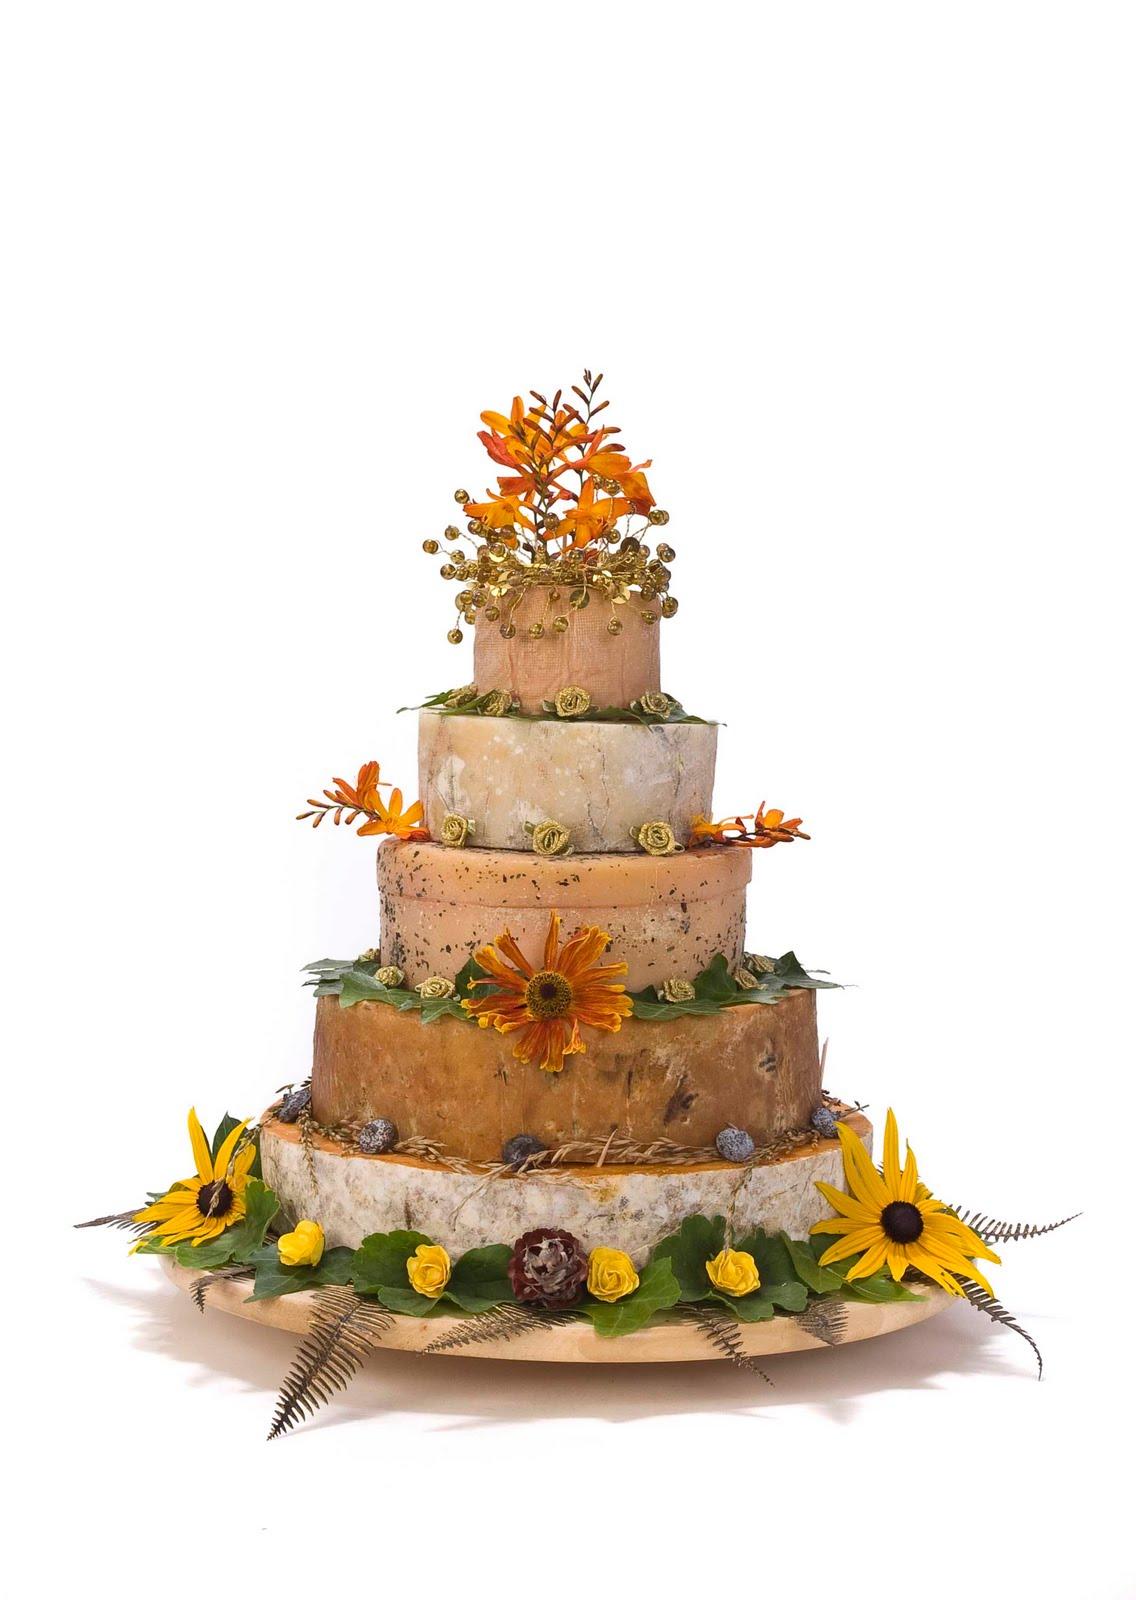 Fabulous Food Friday 16 Cheese Weddings Cakes